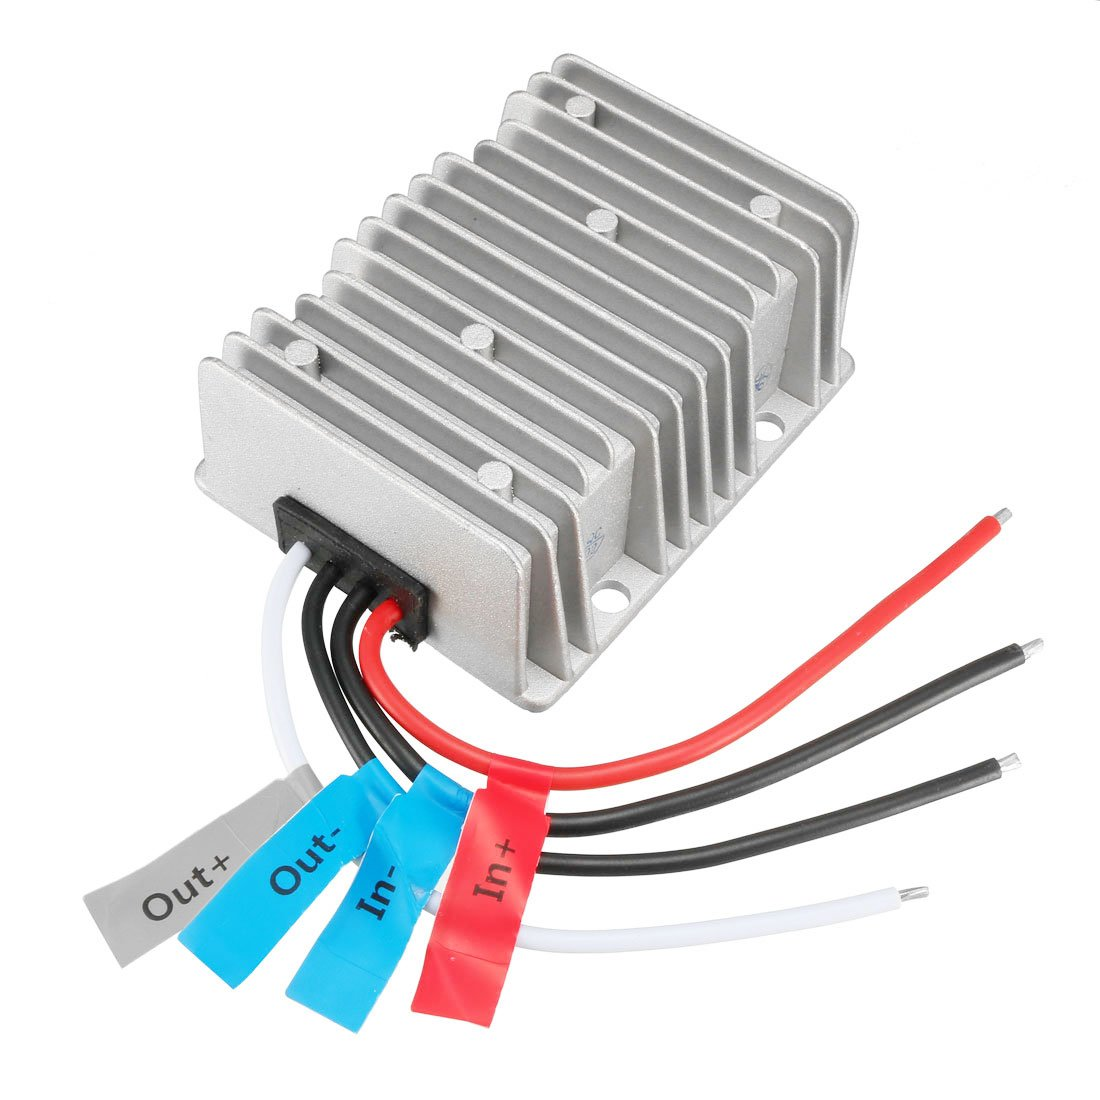 uxcell Voltage Converter Regulator DC/DC DC 12V Step-Up to DC 28V 15A 420W Power Boost Transformer Waterproof